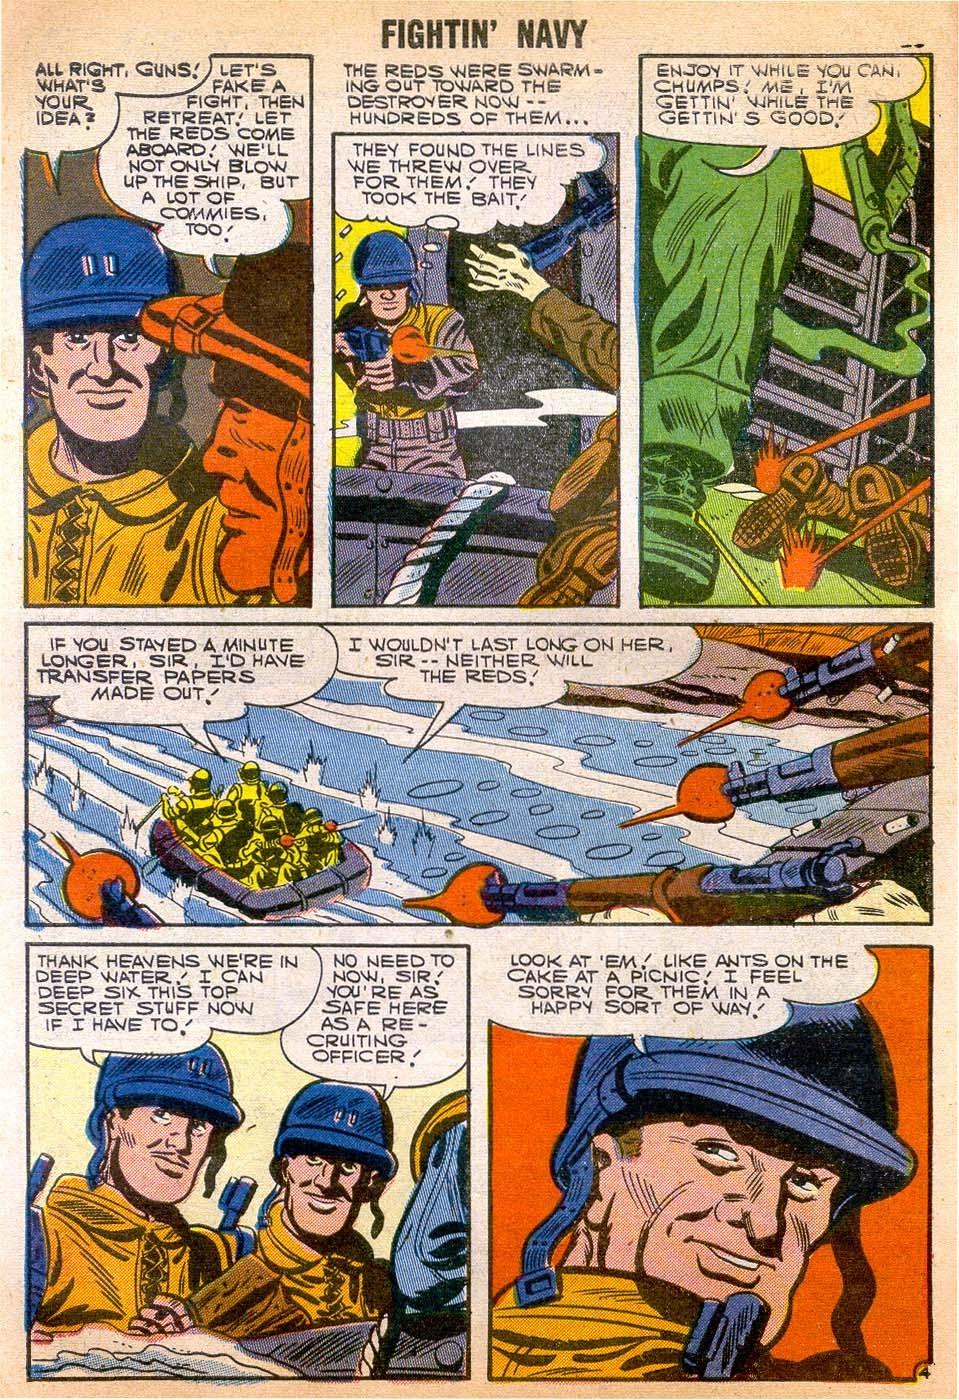 Read online Fightin' Navy comic -  Issue #79 - 30